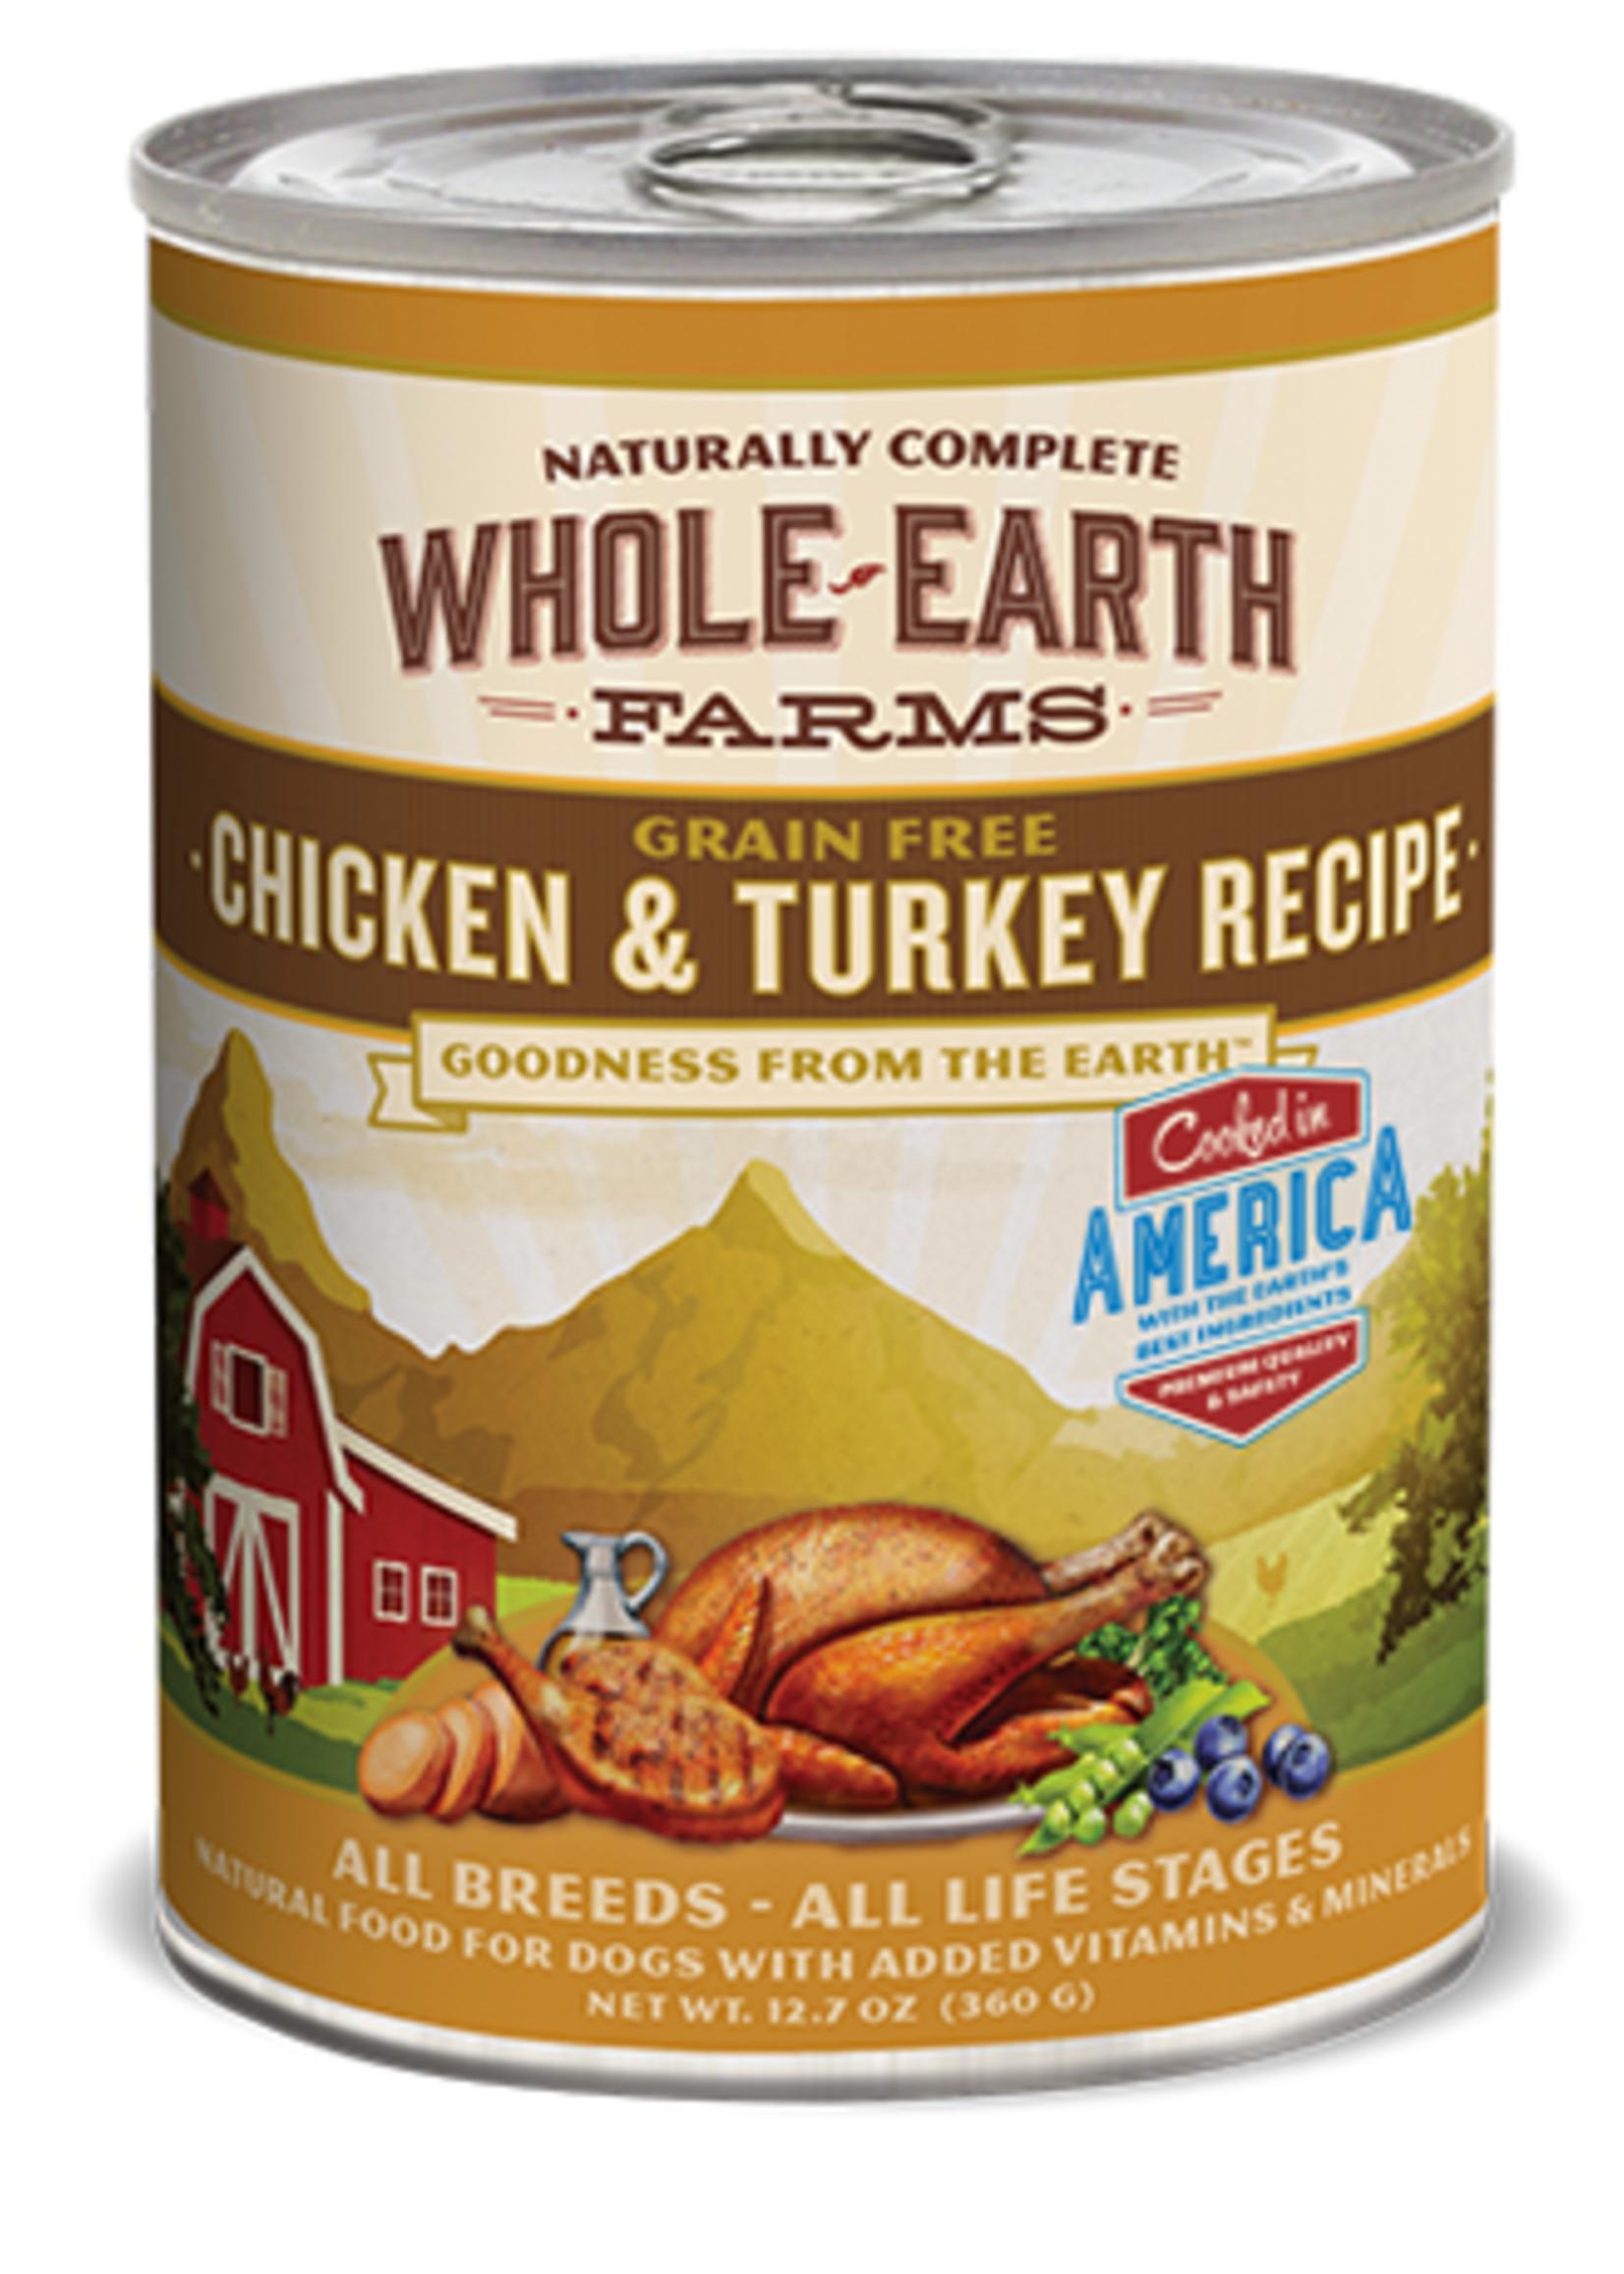 Merrick® MERRICK WHOLE EARTH FARMS GRAIN FREE CHICKEN & TURKEY RECEIPE 12.7oz